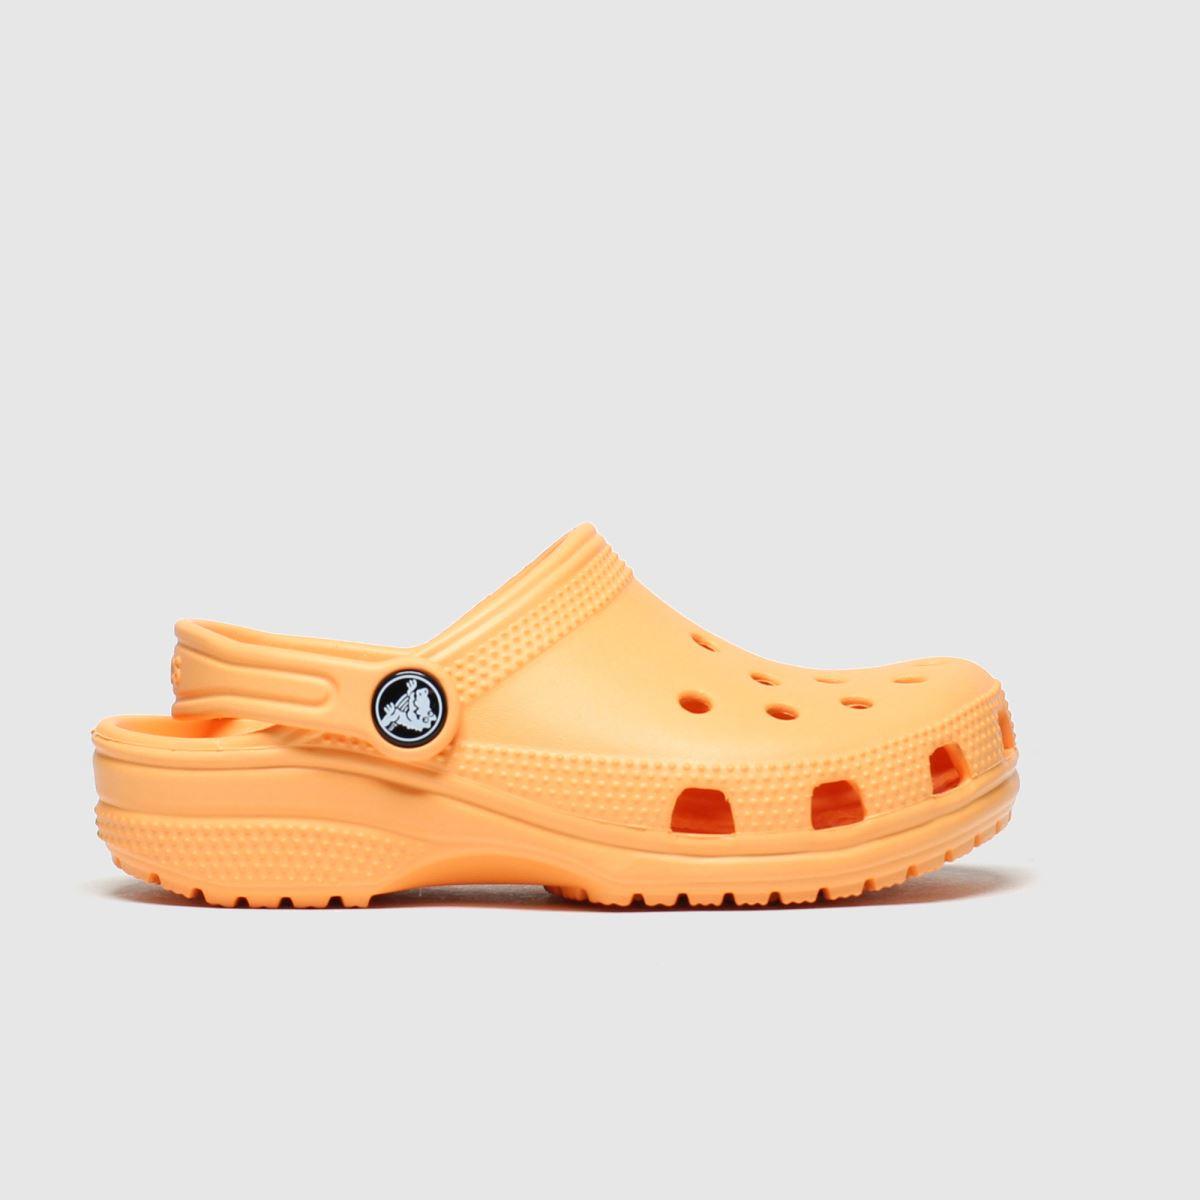 Crocs Orange Classic Clog Trainers Toddler